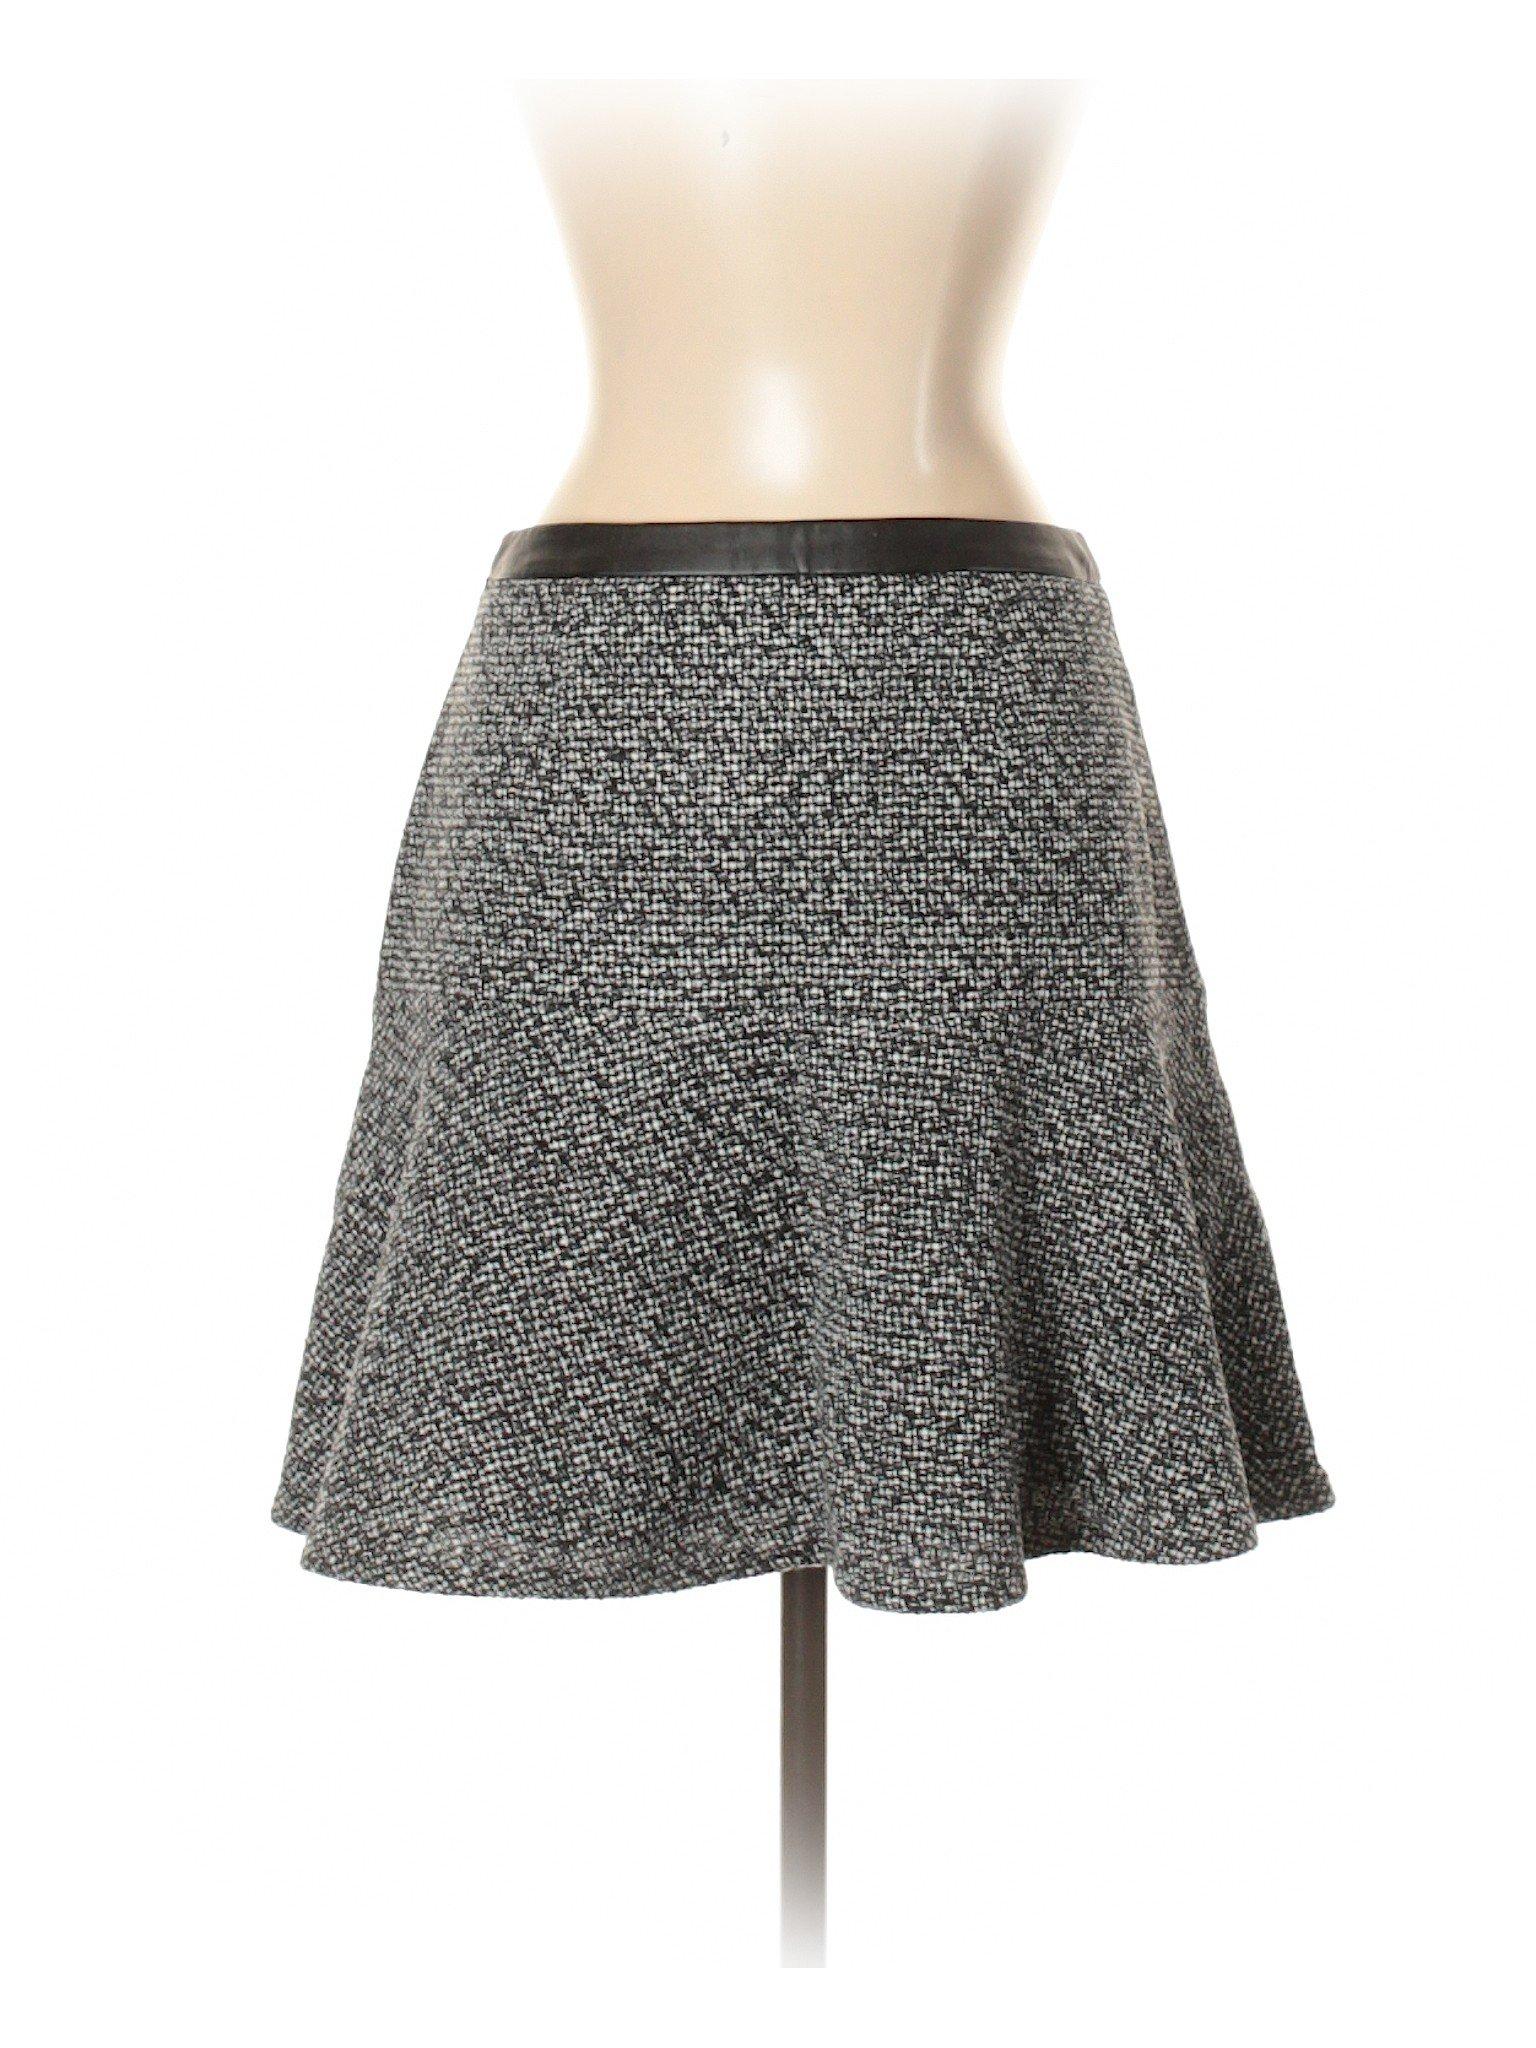 Boutique Skirt Casual Skirt Casual Boutique Boutique ROHqTOw